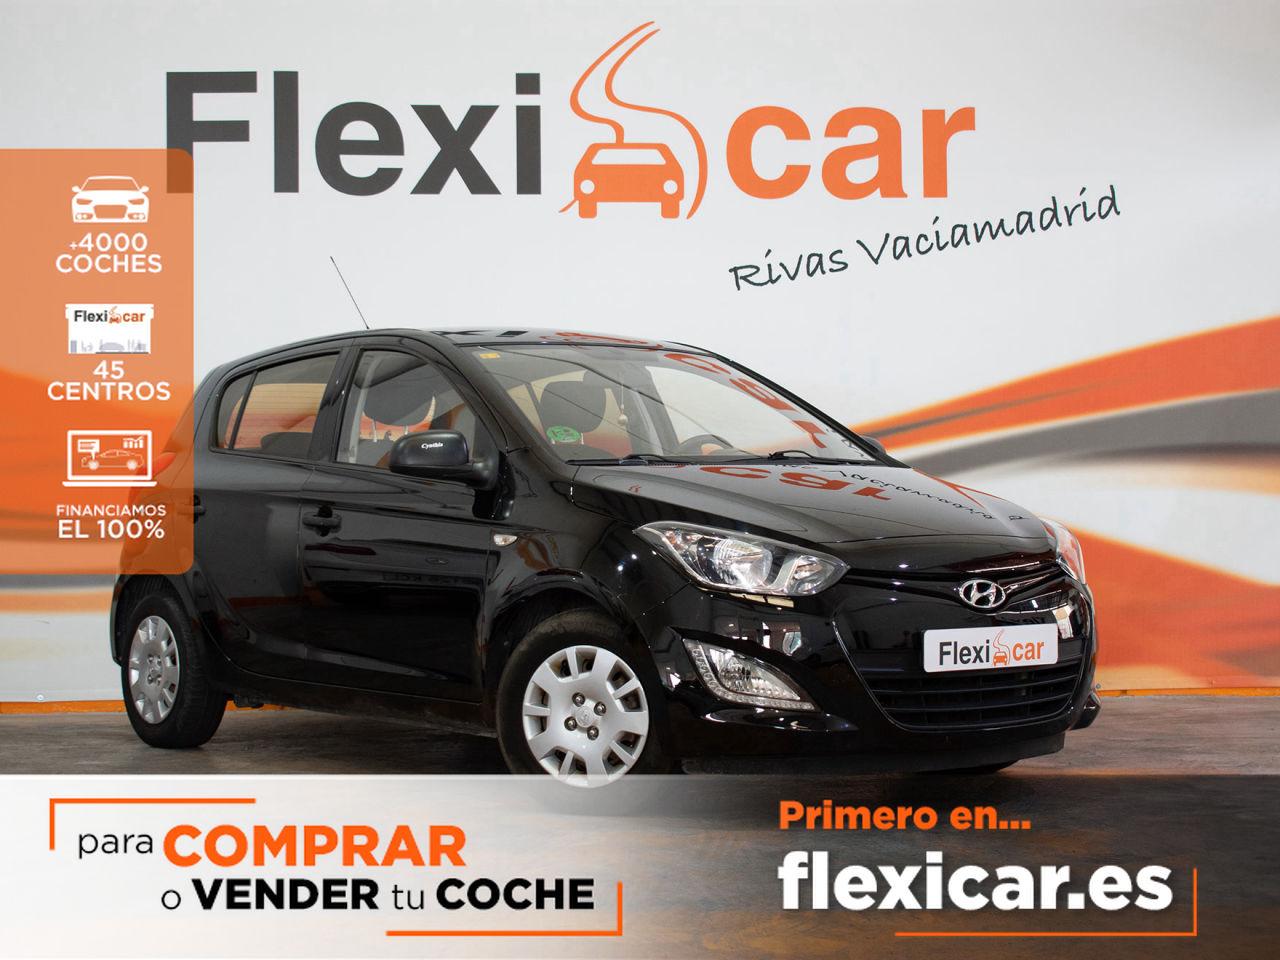 Hyundai i20 ocasión segunda mano 2013 Gasolina por 7.490€ en Huelva